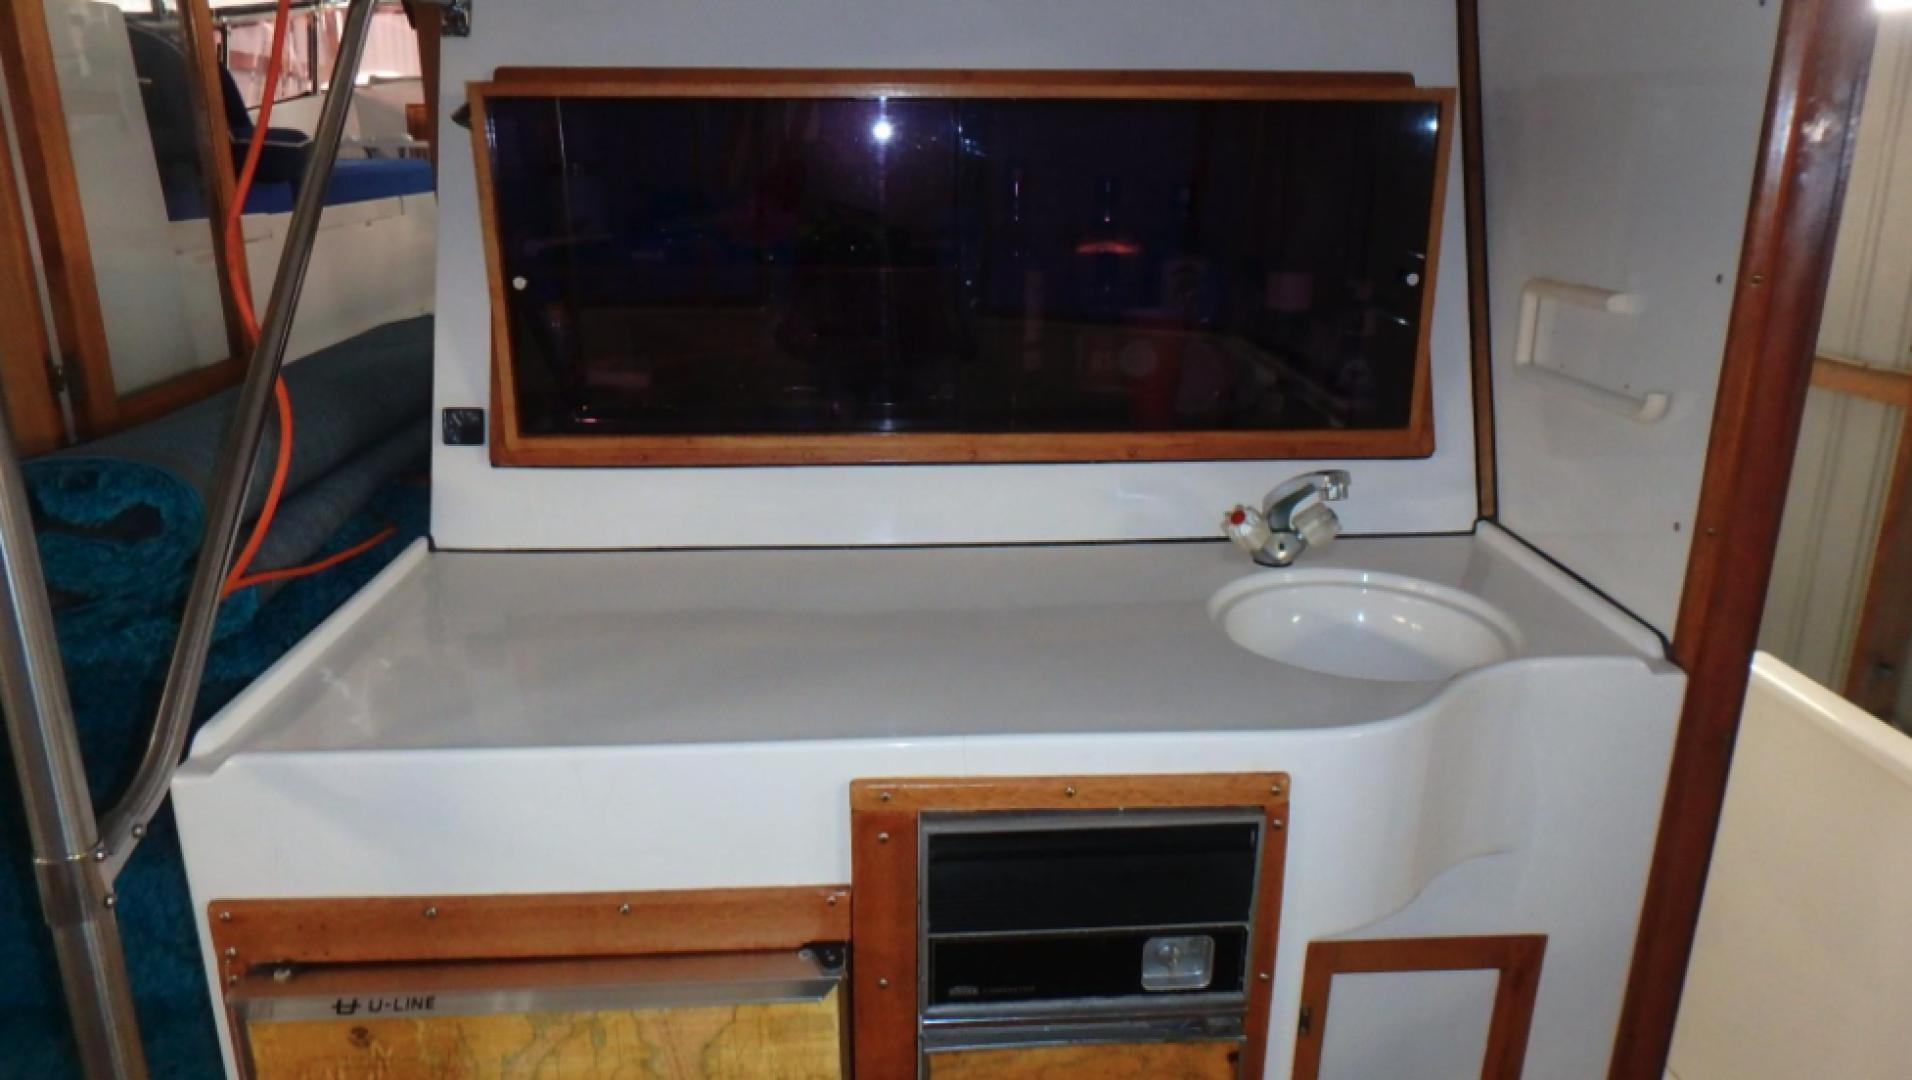 Nova-Yachtfish 1986-Folly Bremerton-Washington-United States-1550354 | Thumbnail